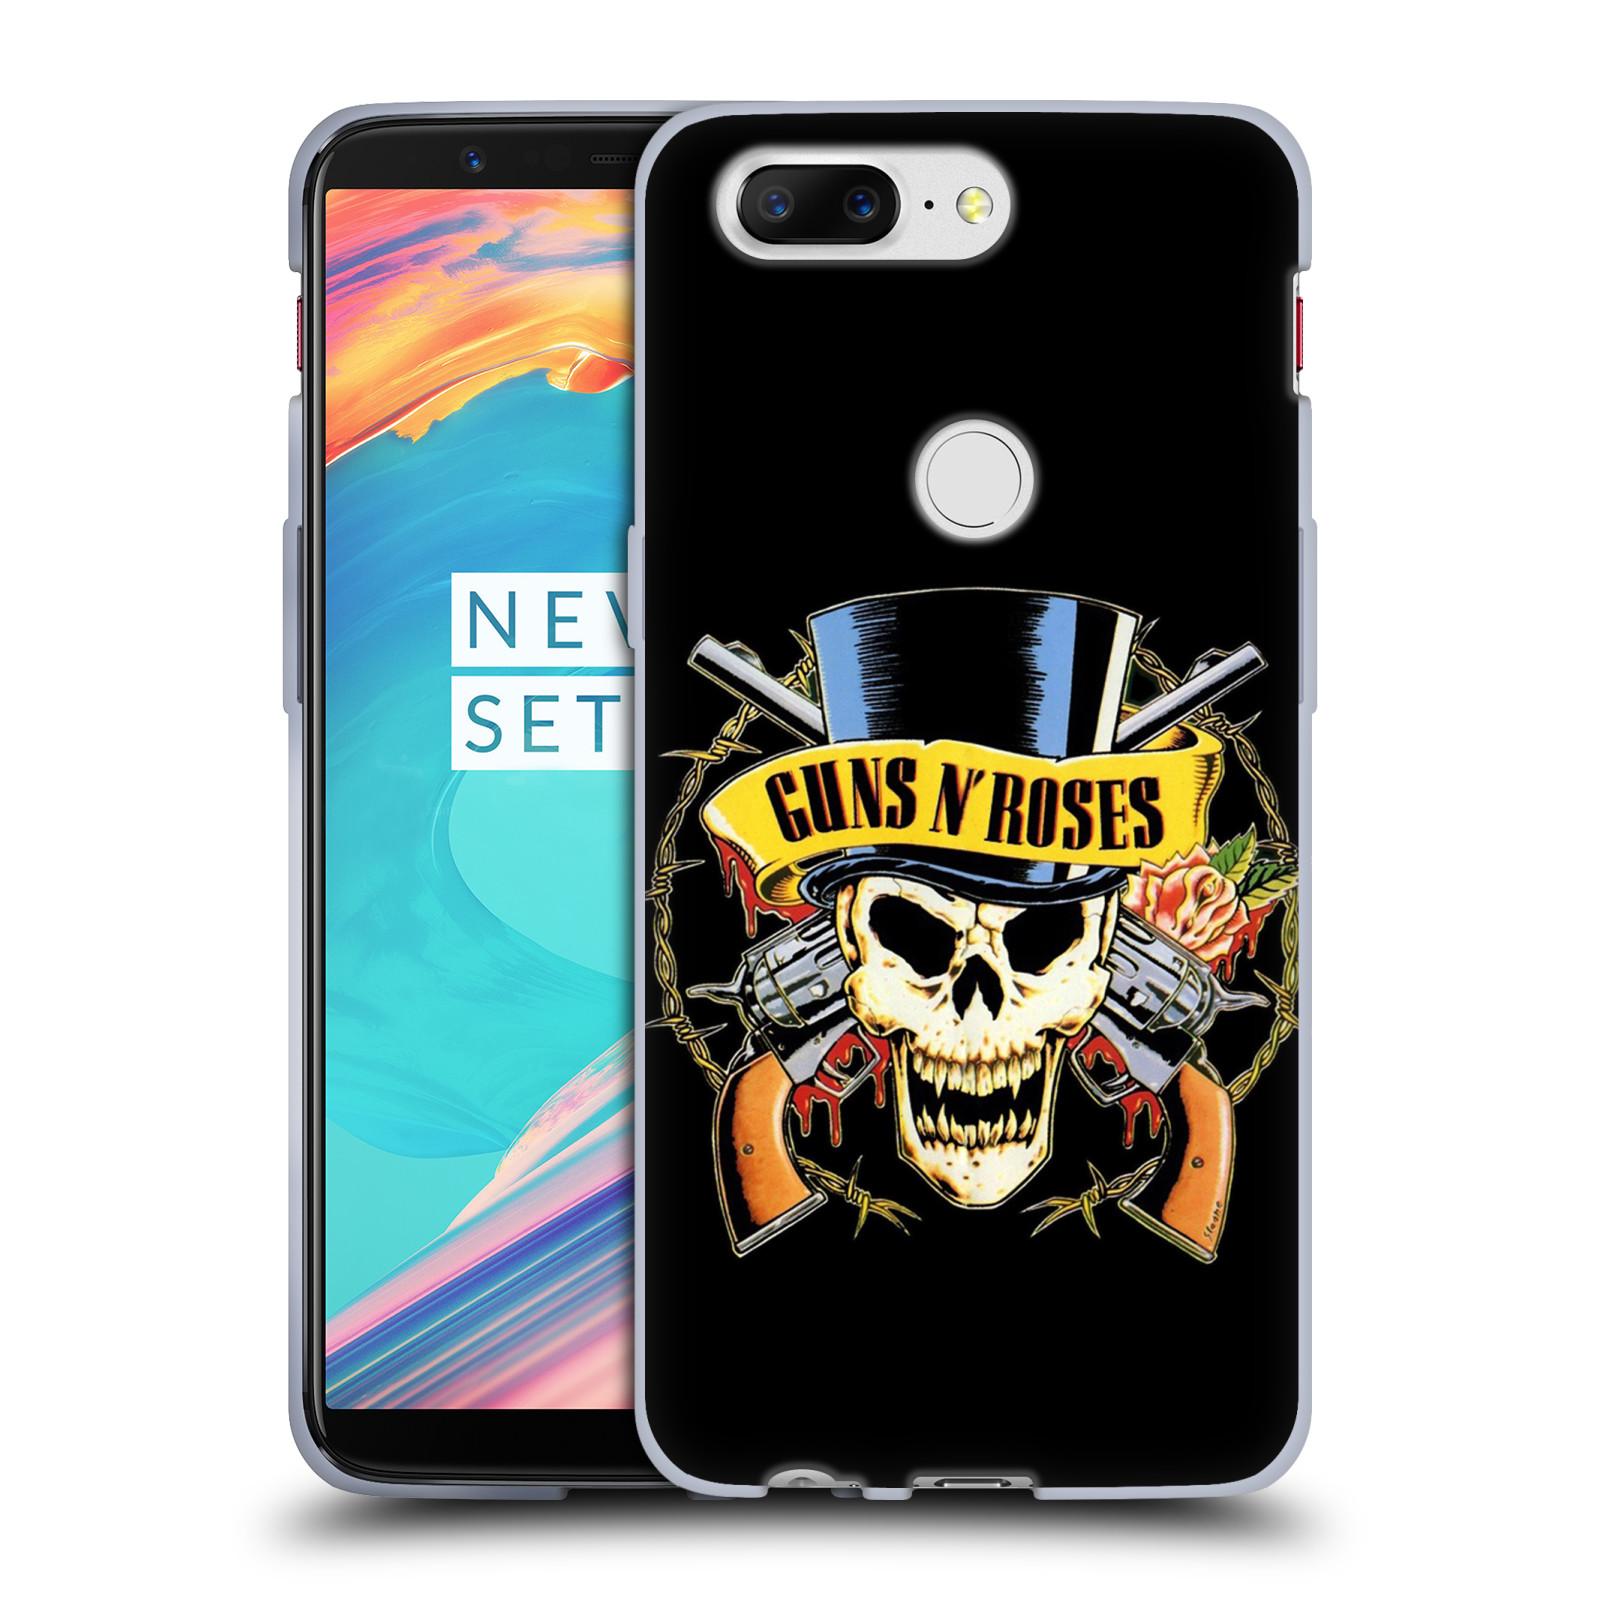 Silikonové pouzdro na mobil OnePlus 5T - Head Case - Guns N' Roses - Lebka